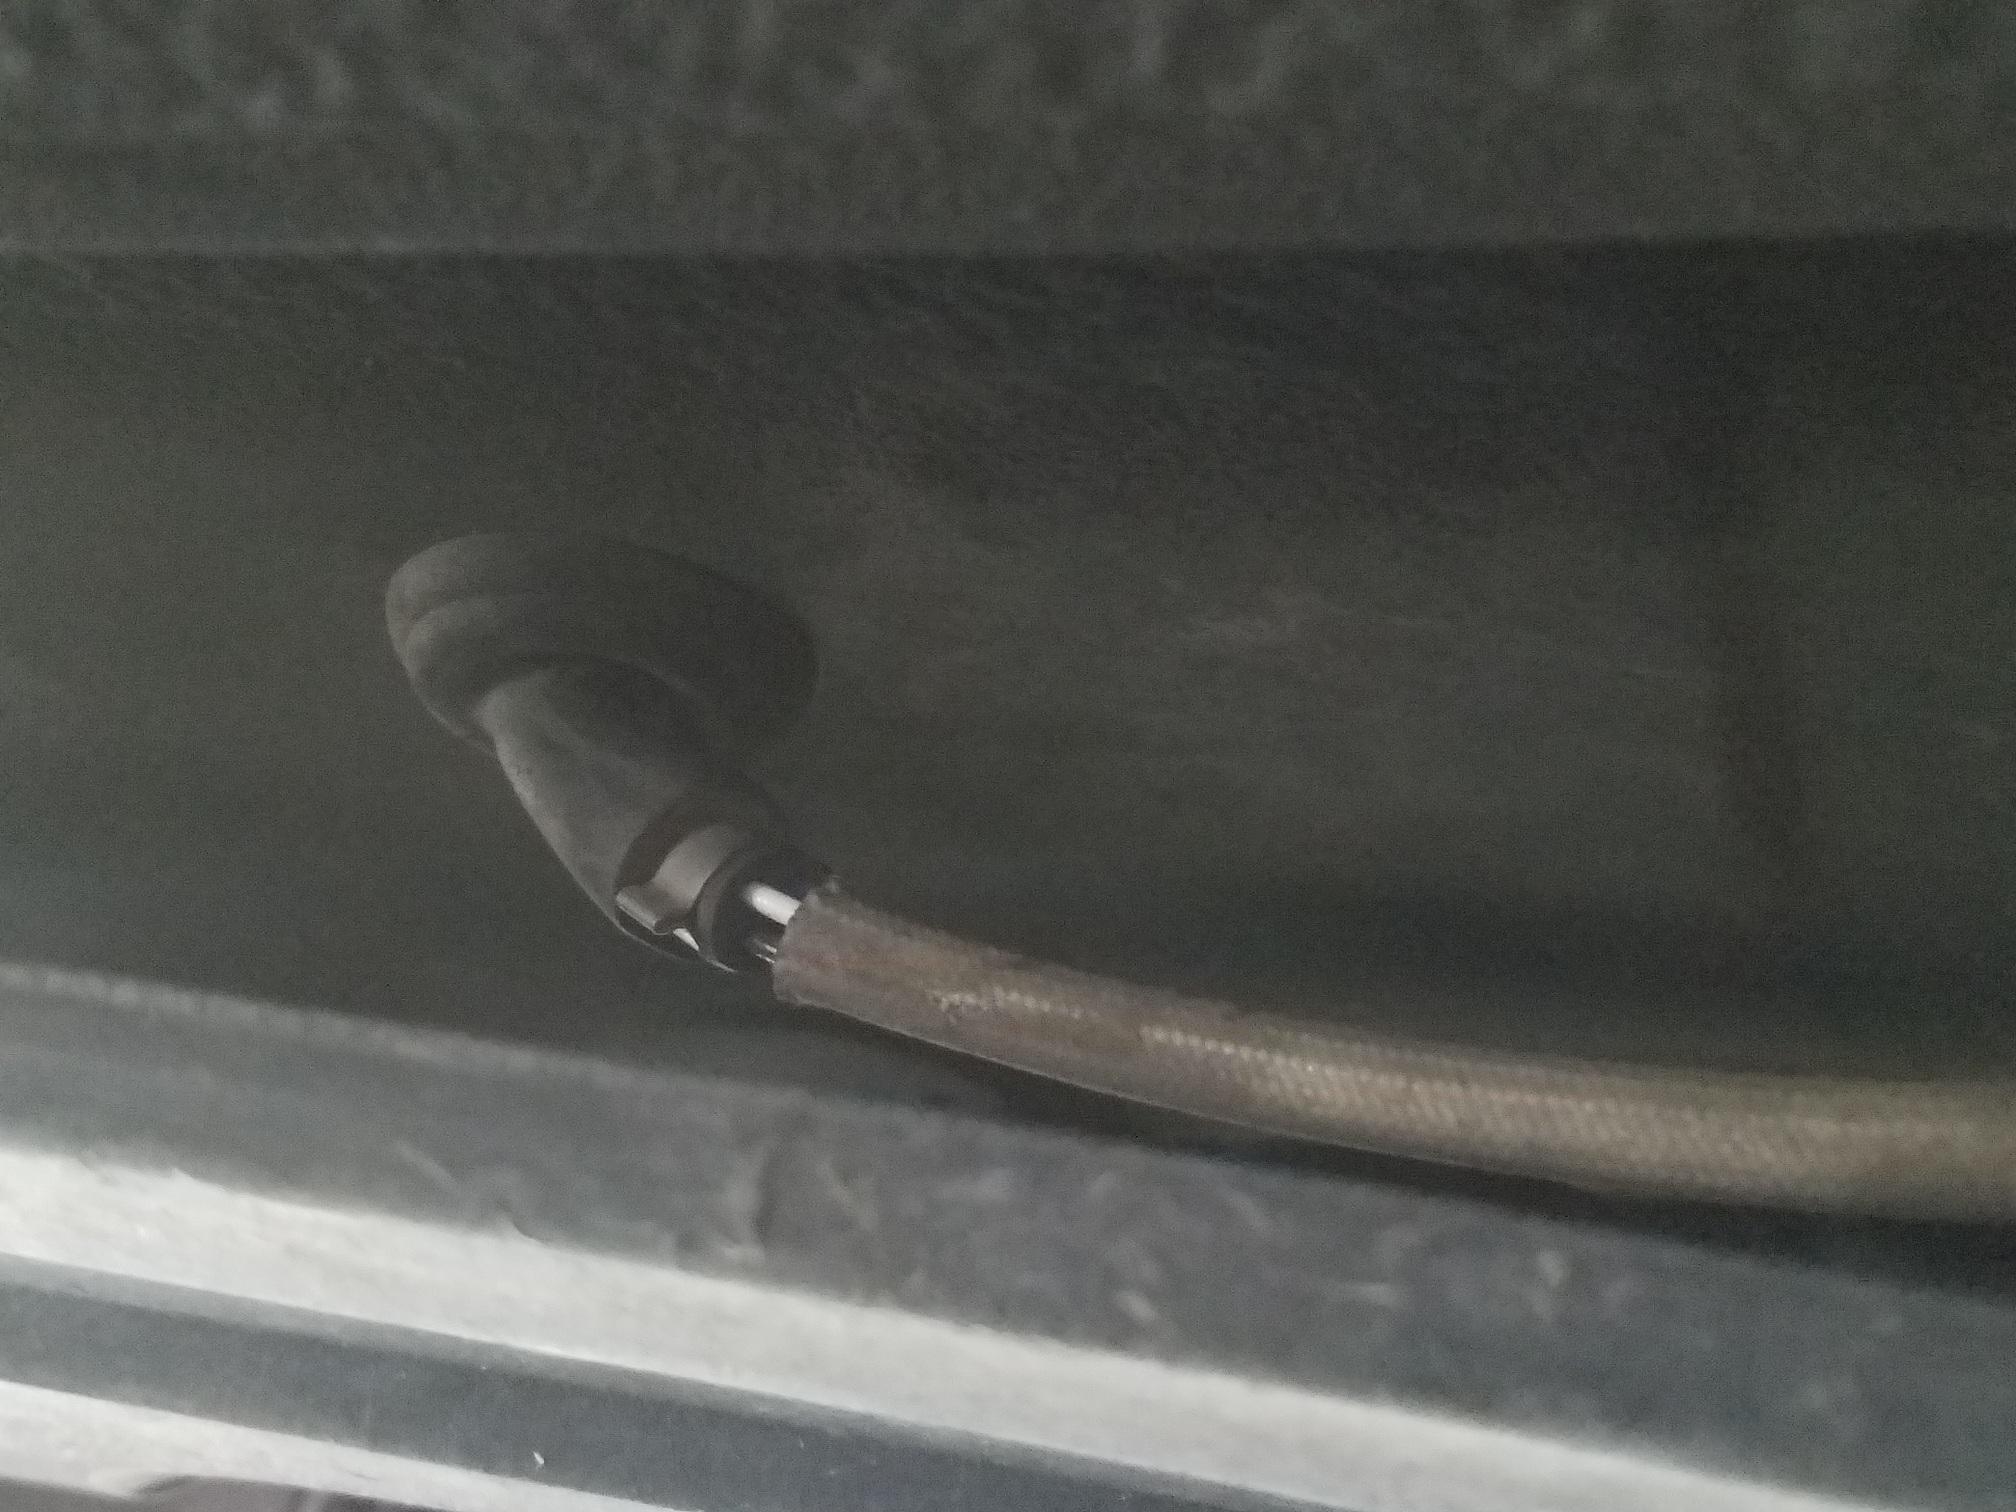 DIY: How to replace O2 sensor for B2S2-new-black-rubber-plug.jpg